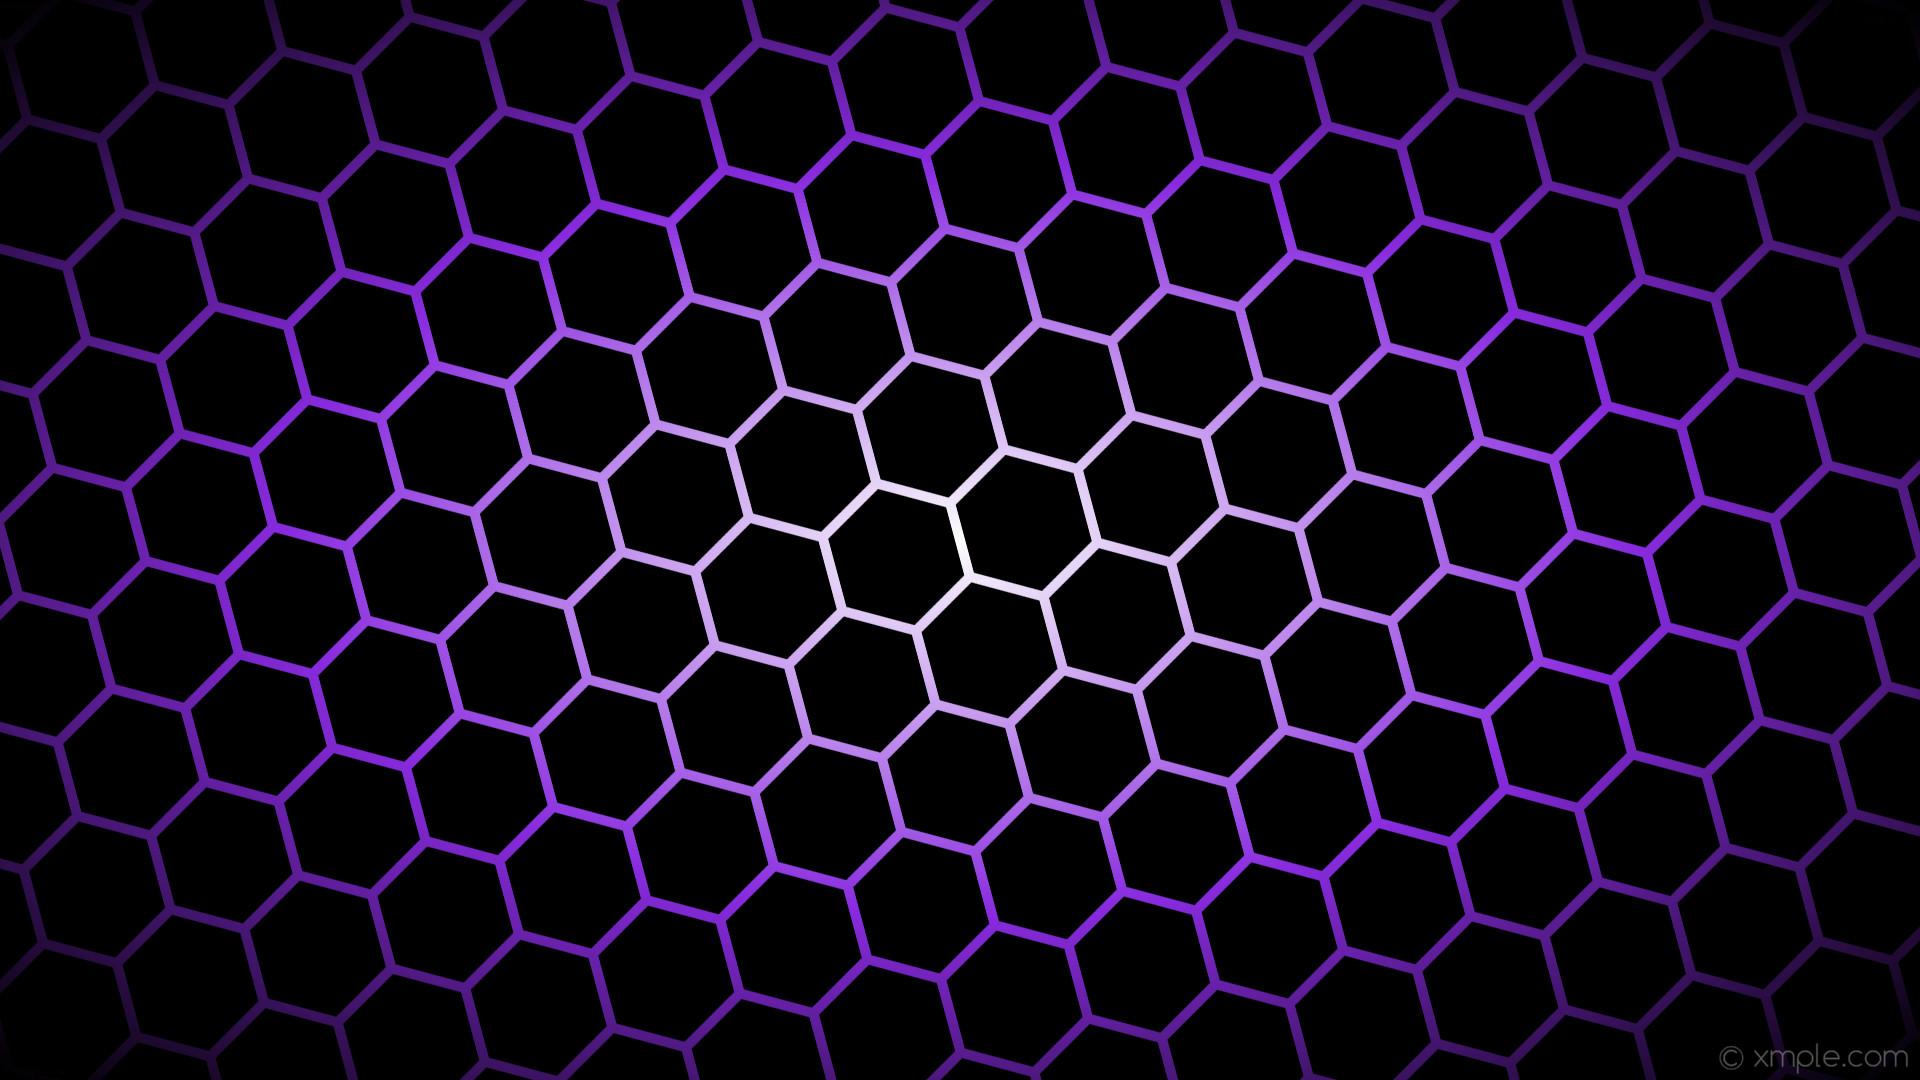 Res: 1920x1080, wallpaper black glow hexagon white purple gradient blue violet #000000  #ffffff #8a2be2 diagonal